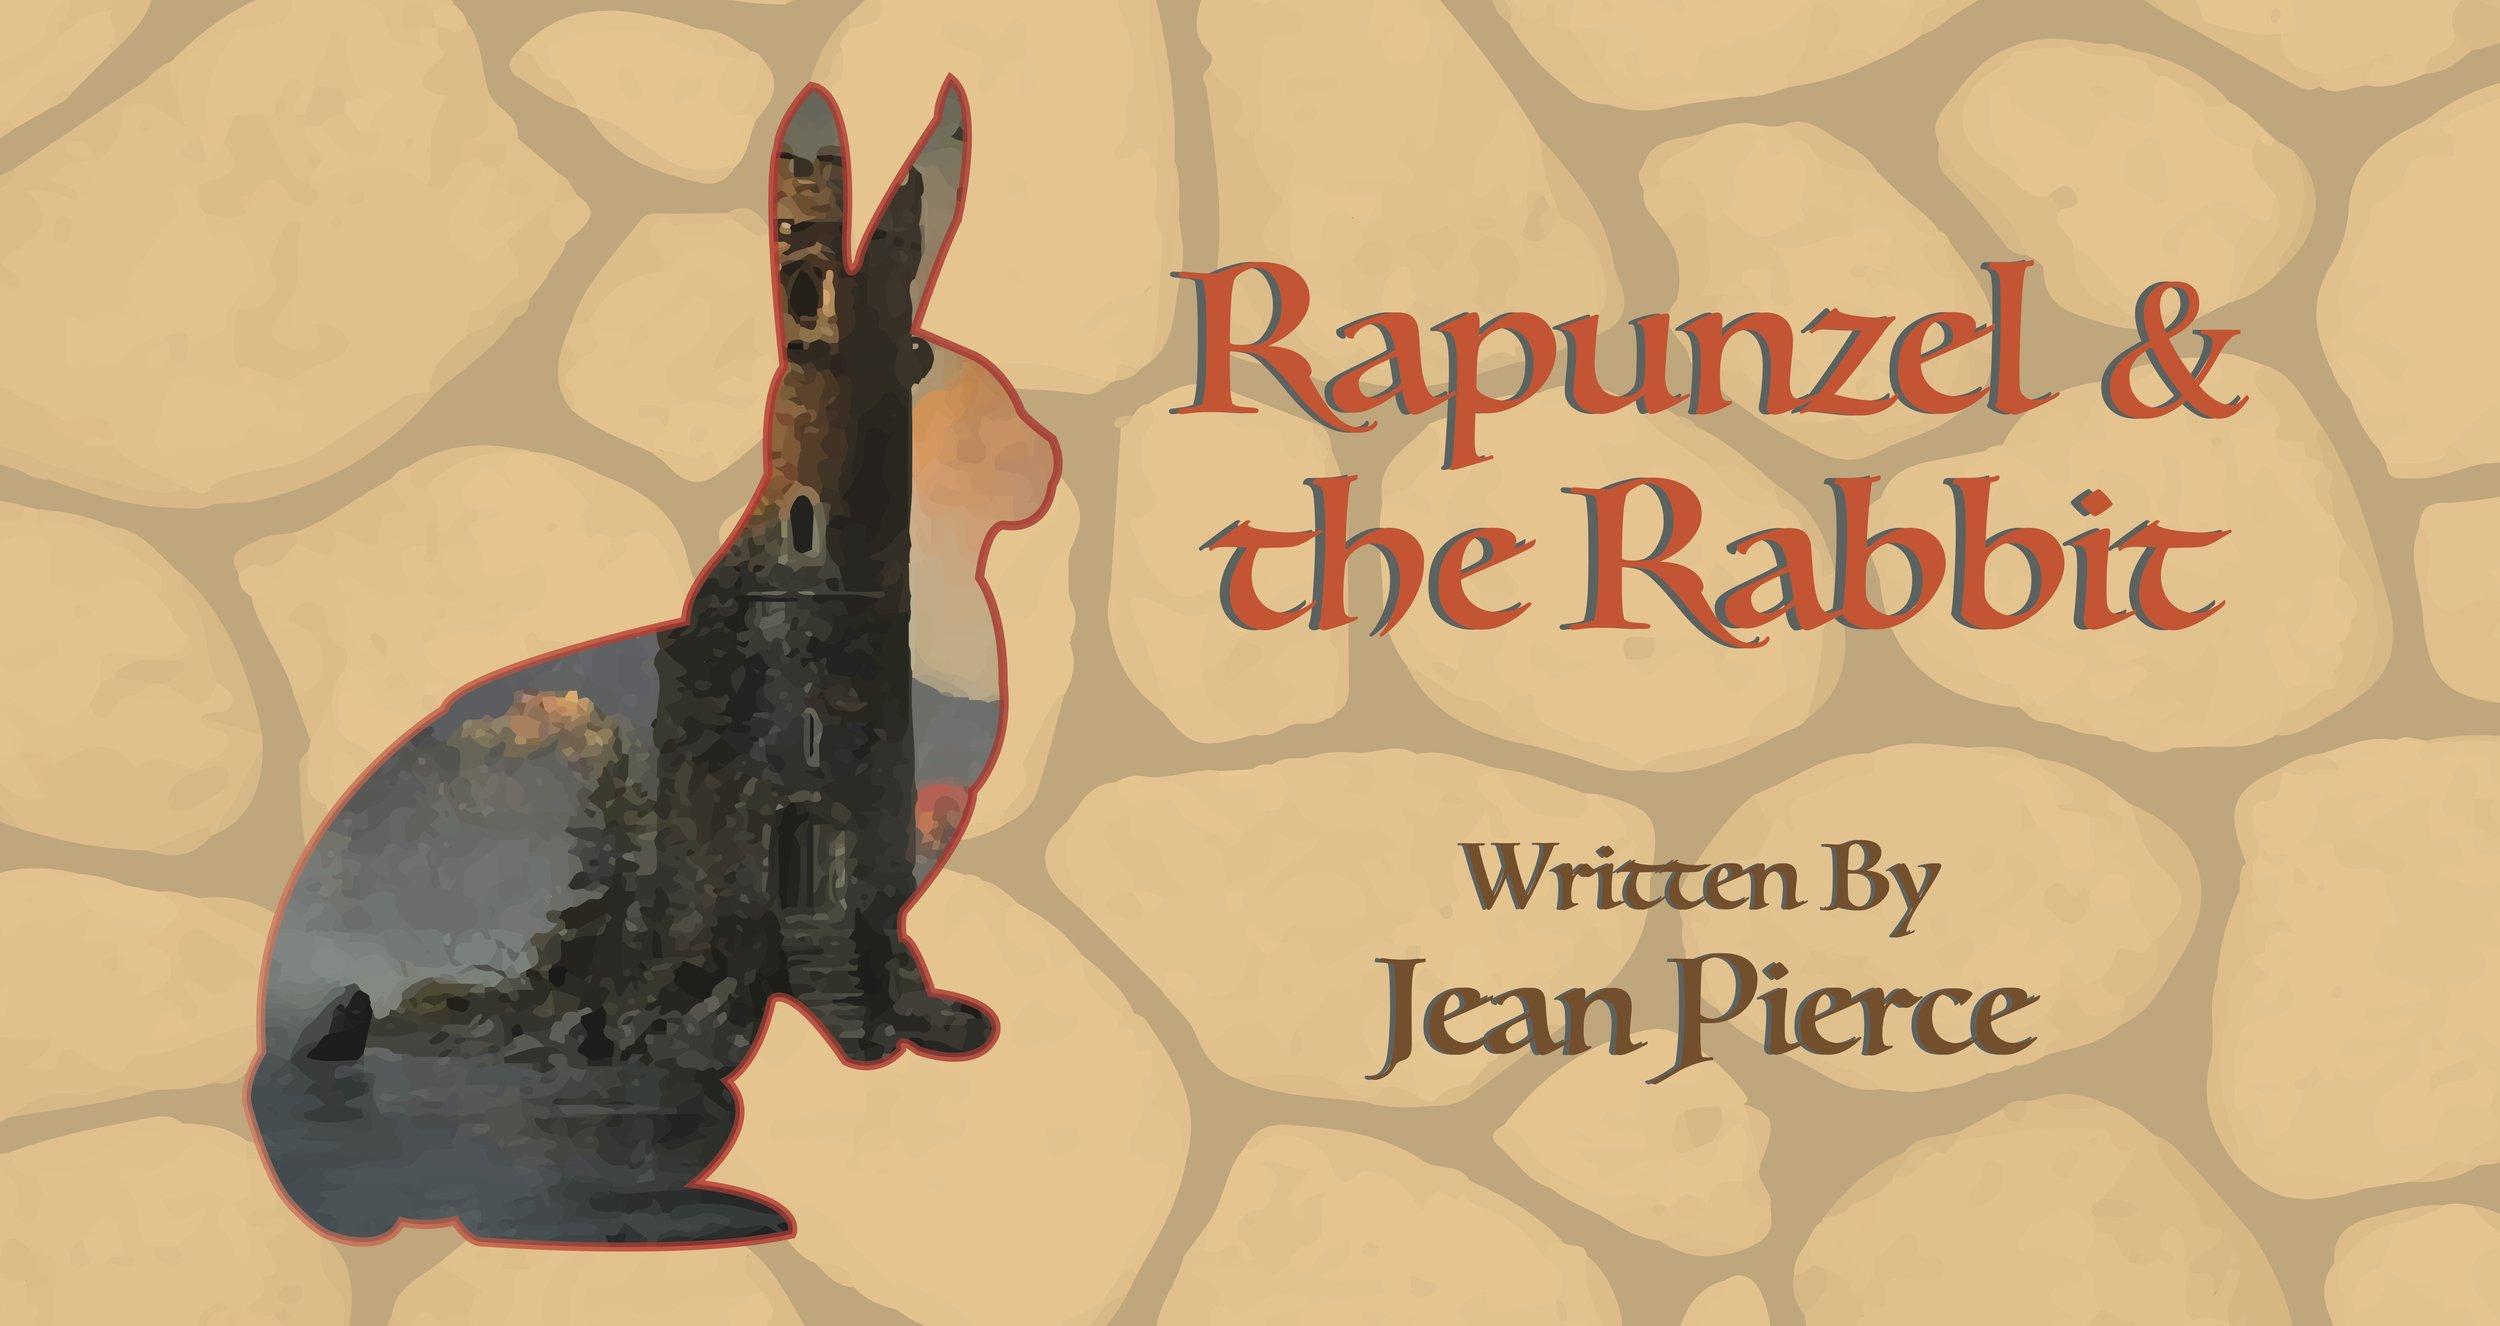 Rapunzel & the Rabbit.jpg